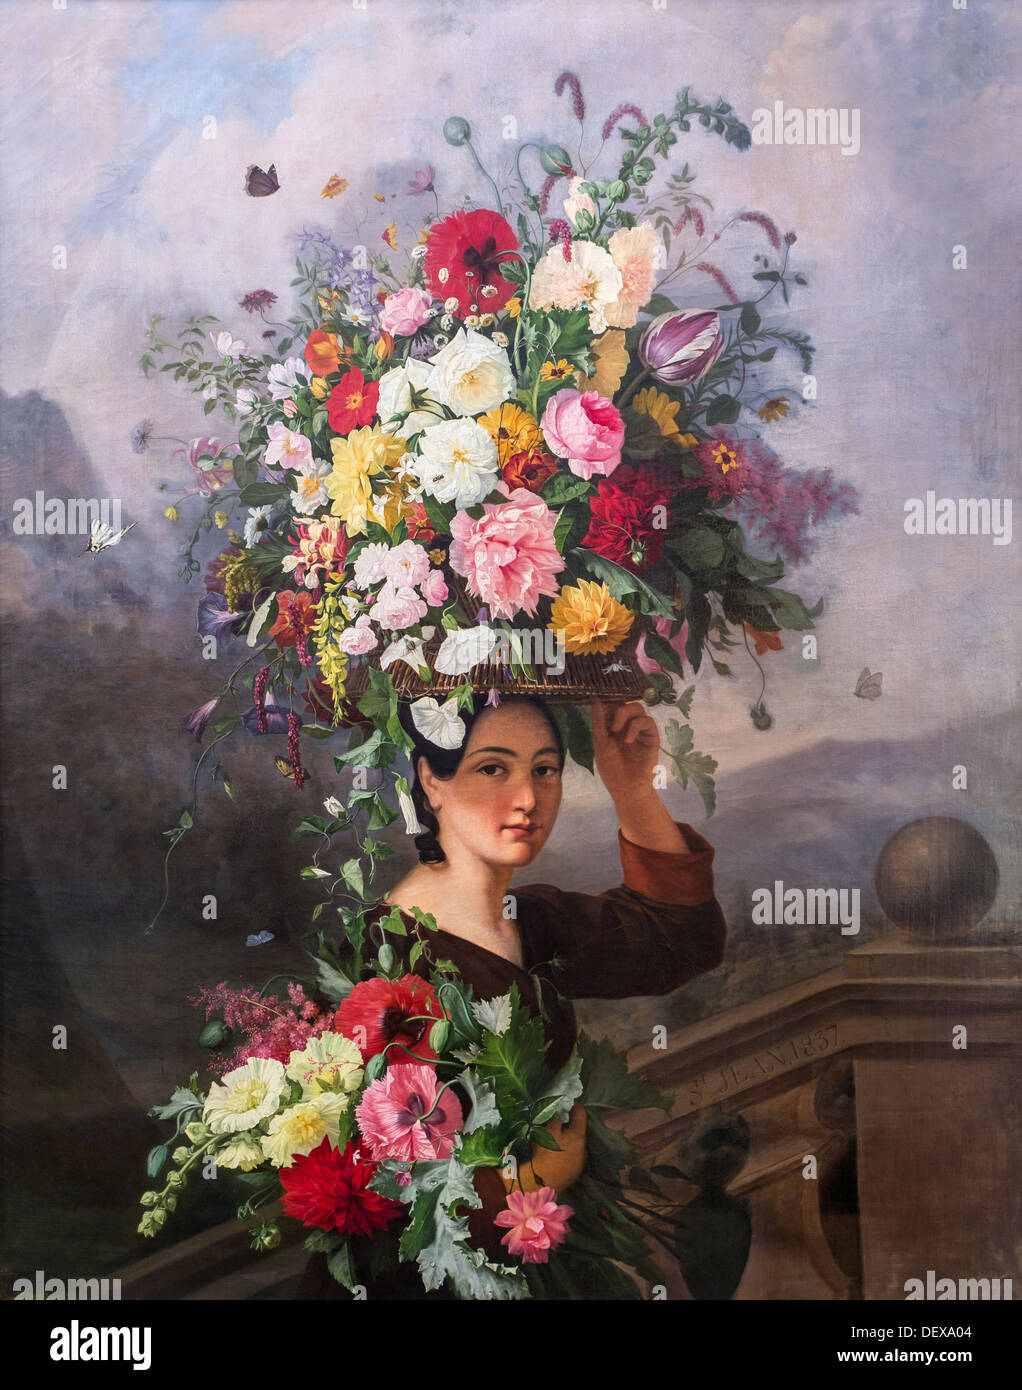 19th century  -  The Gardener, 1837 - Simon Saint-Jean Philippe Sauvan-Magnet / Active Museum oil on canvas - Stock Image